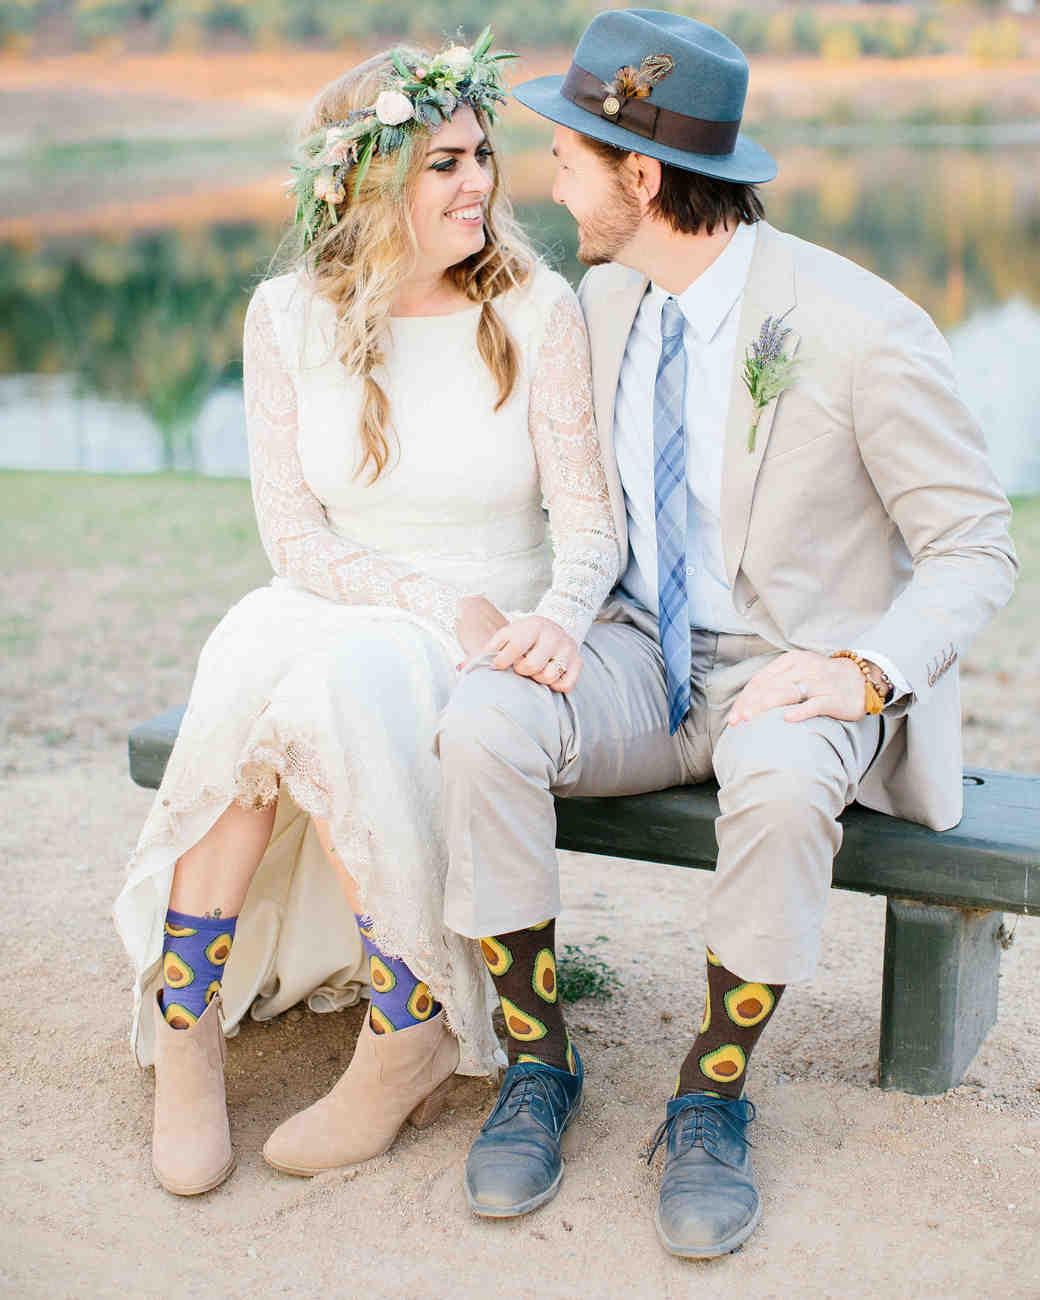 jackie dave wedding couple socks